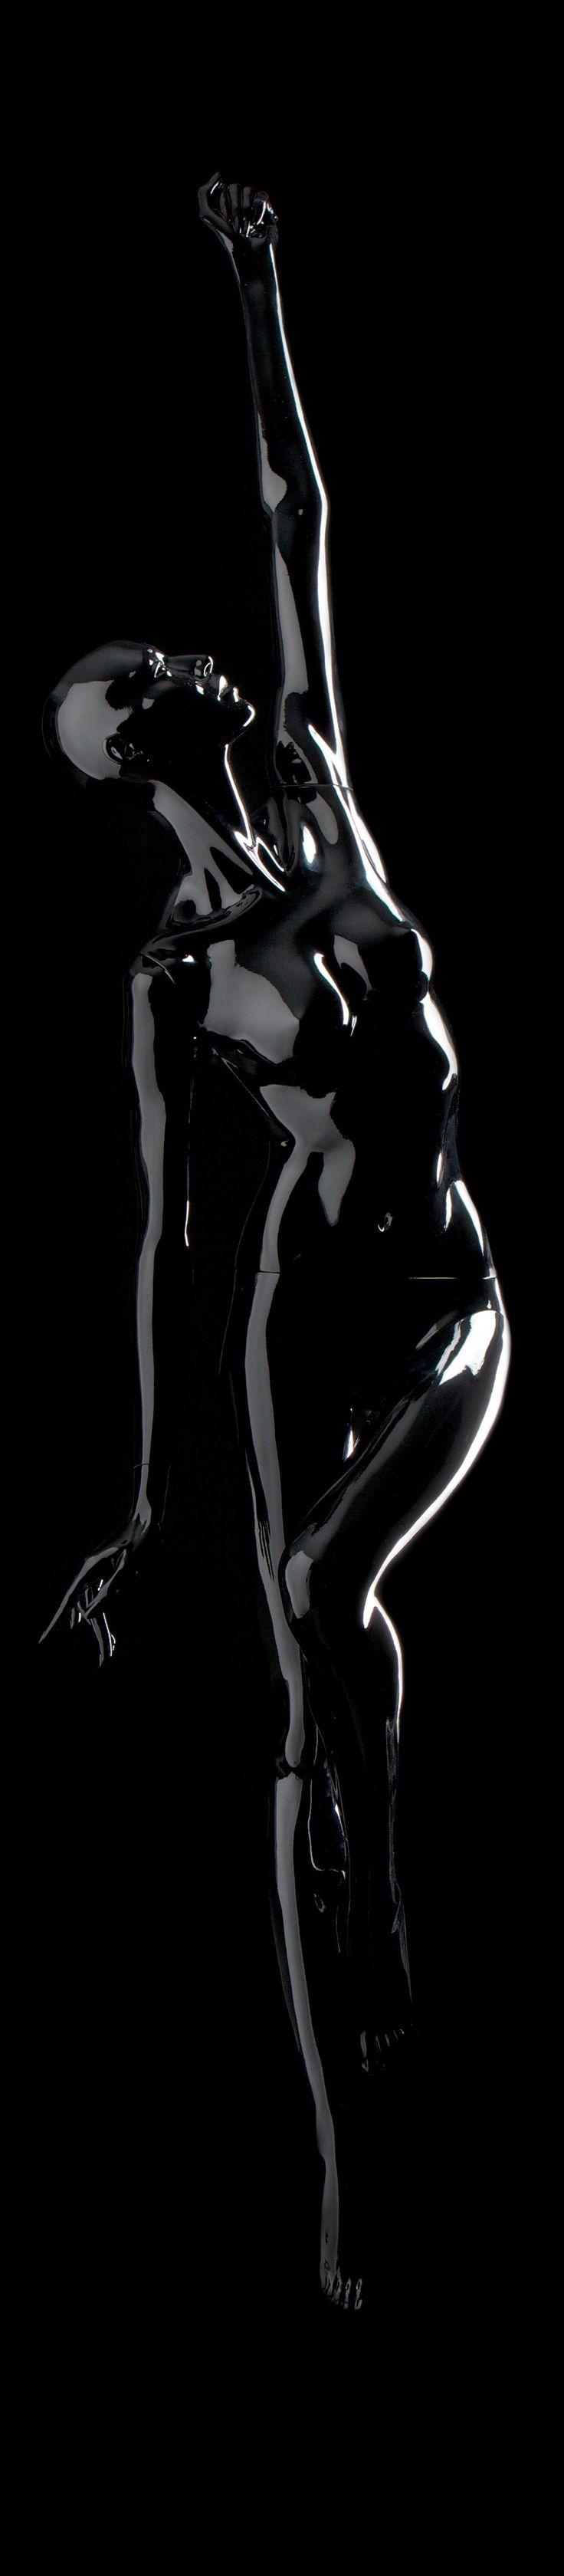 #black #glossy #mannequin